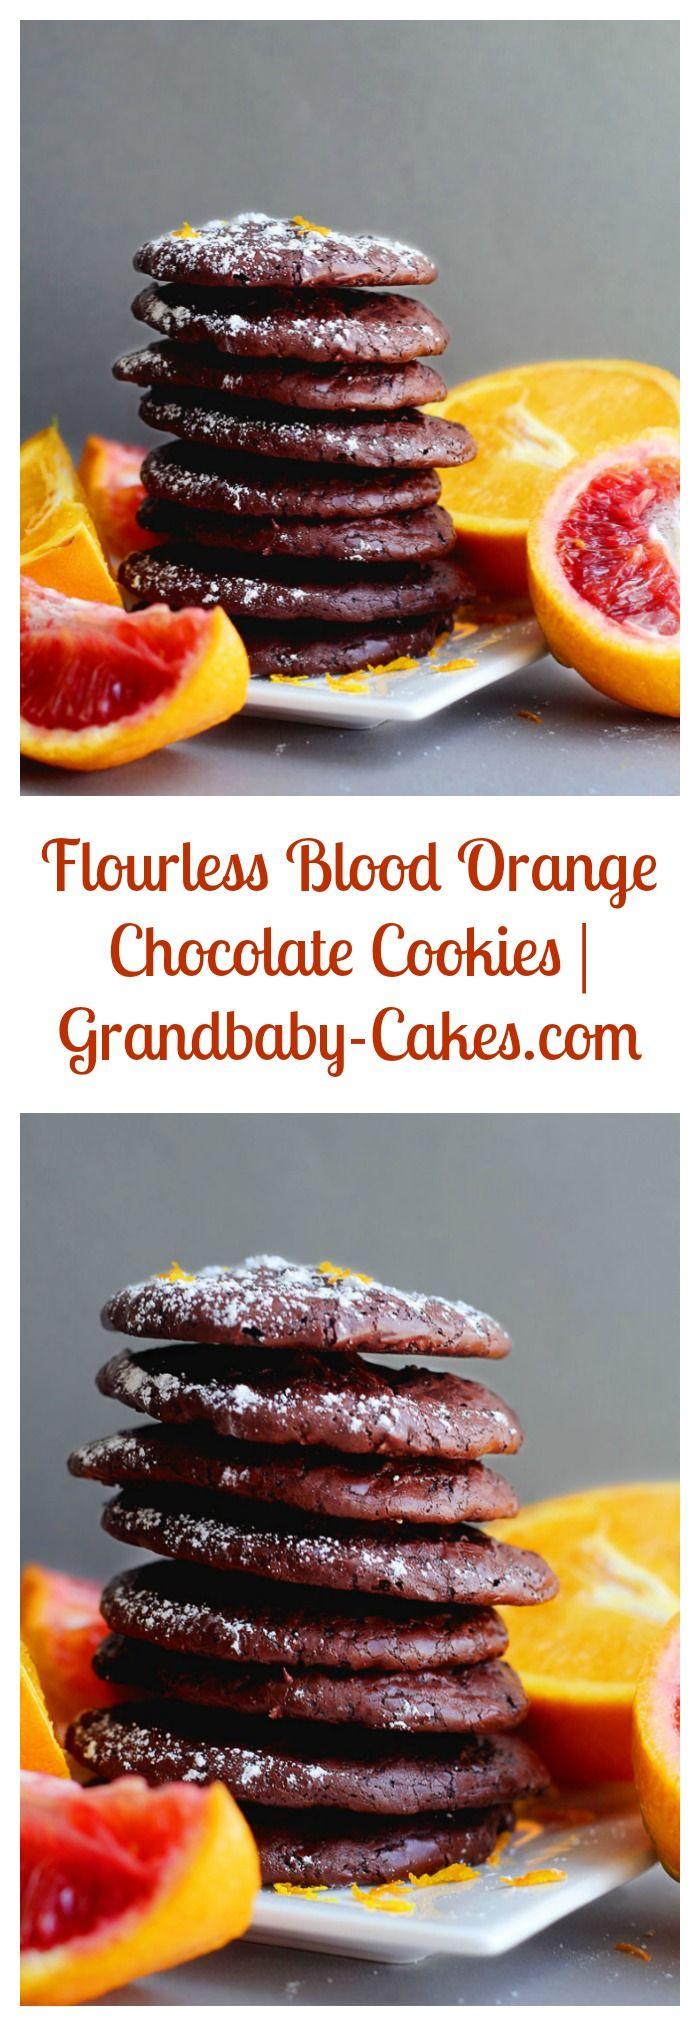 Flourless Blood Orange Chocolate Cookies   Grandbaby-Cakes.com